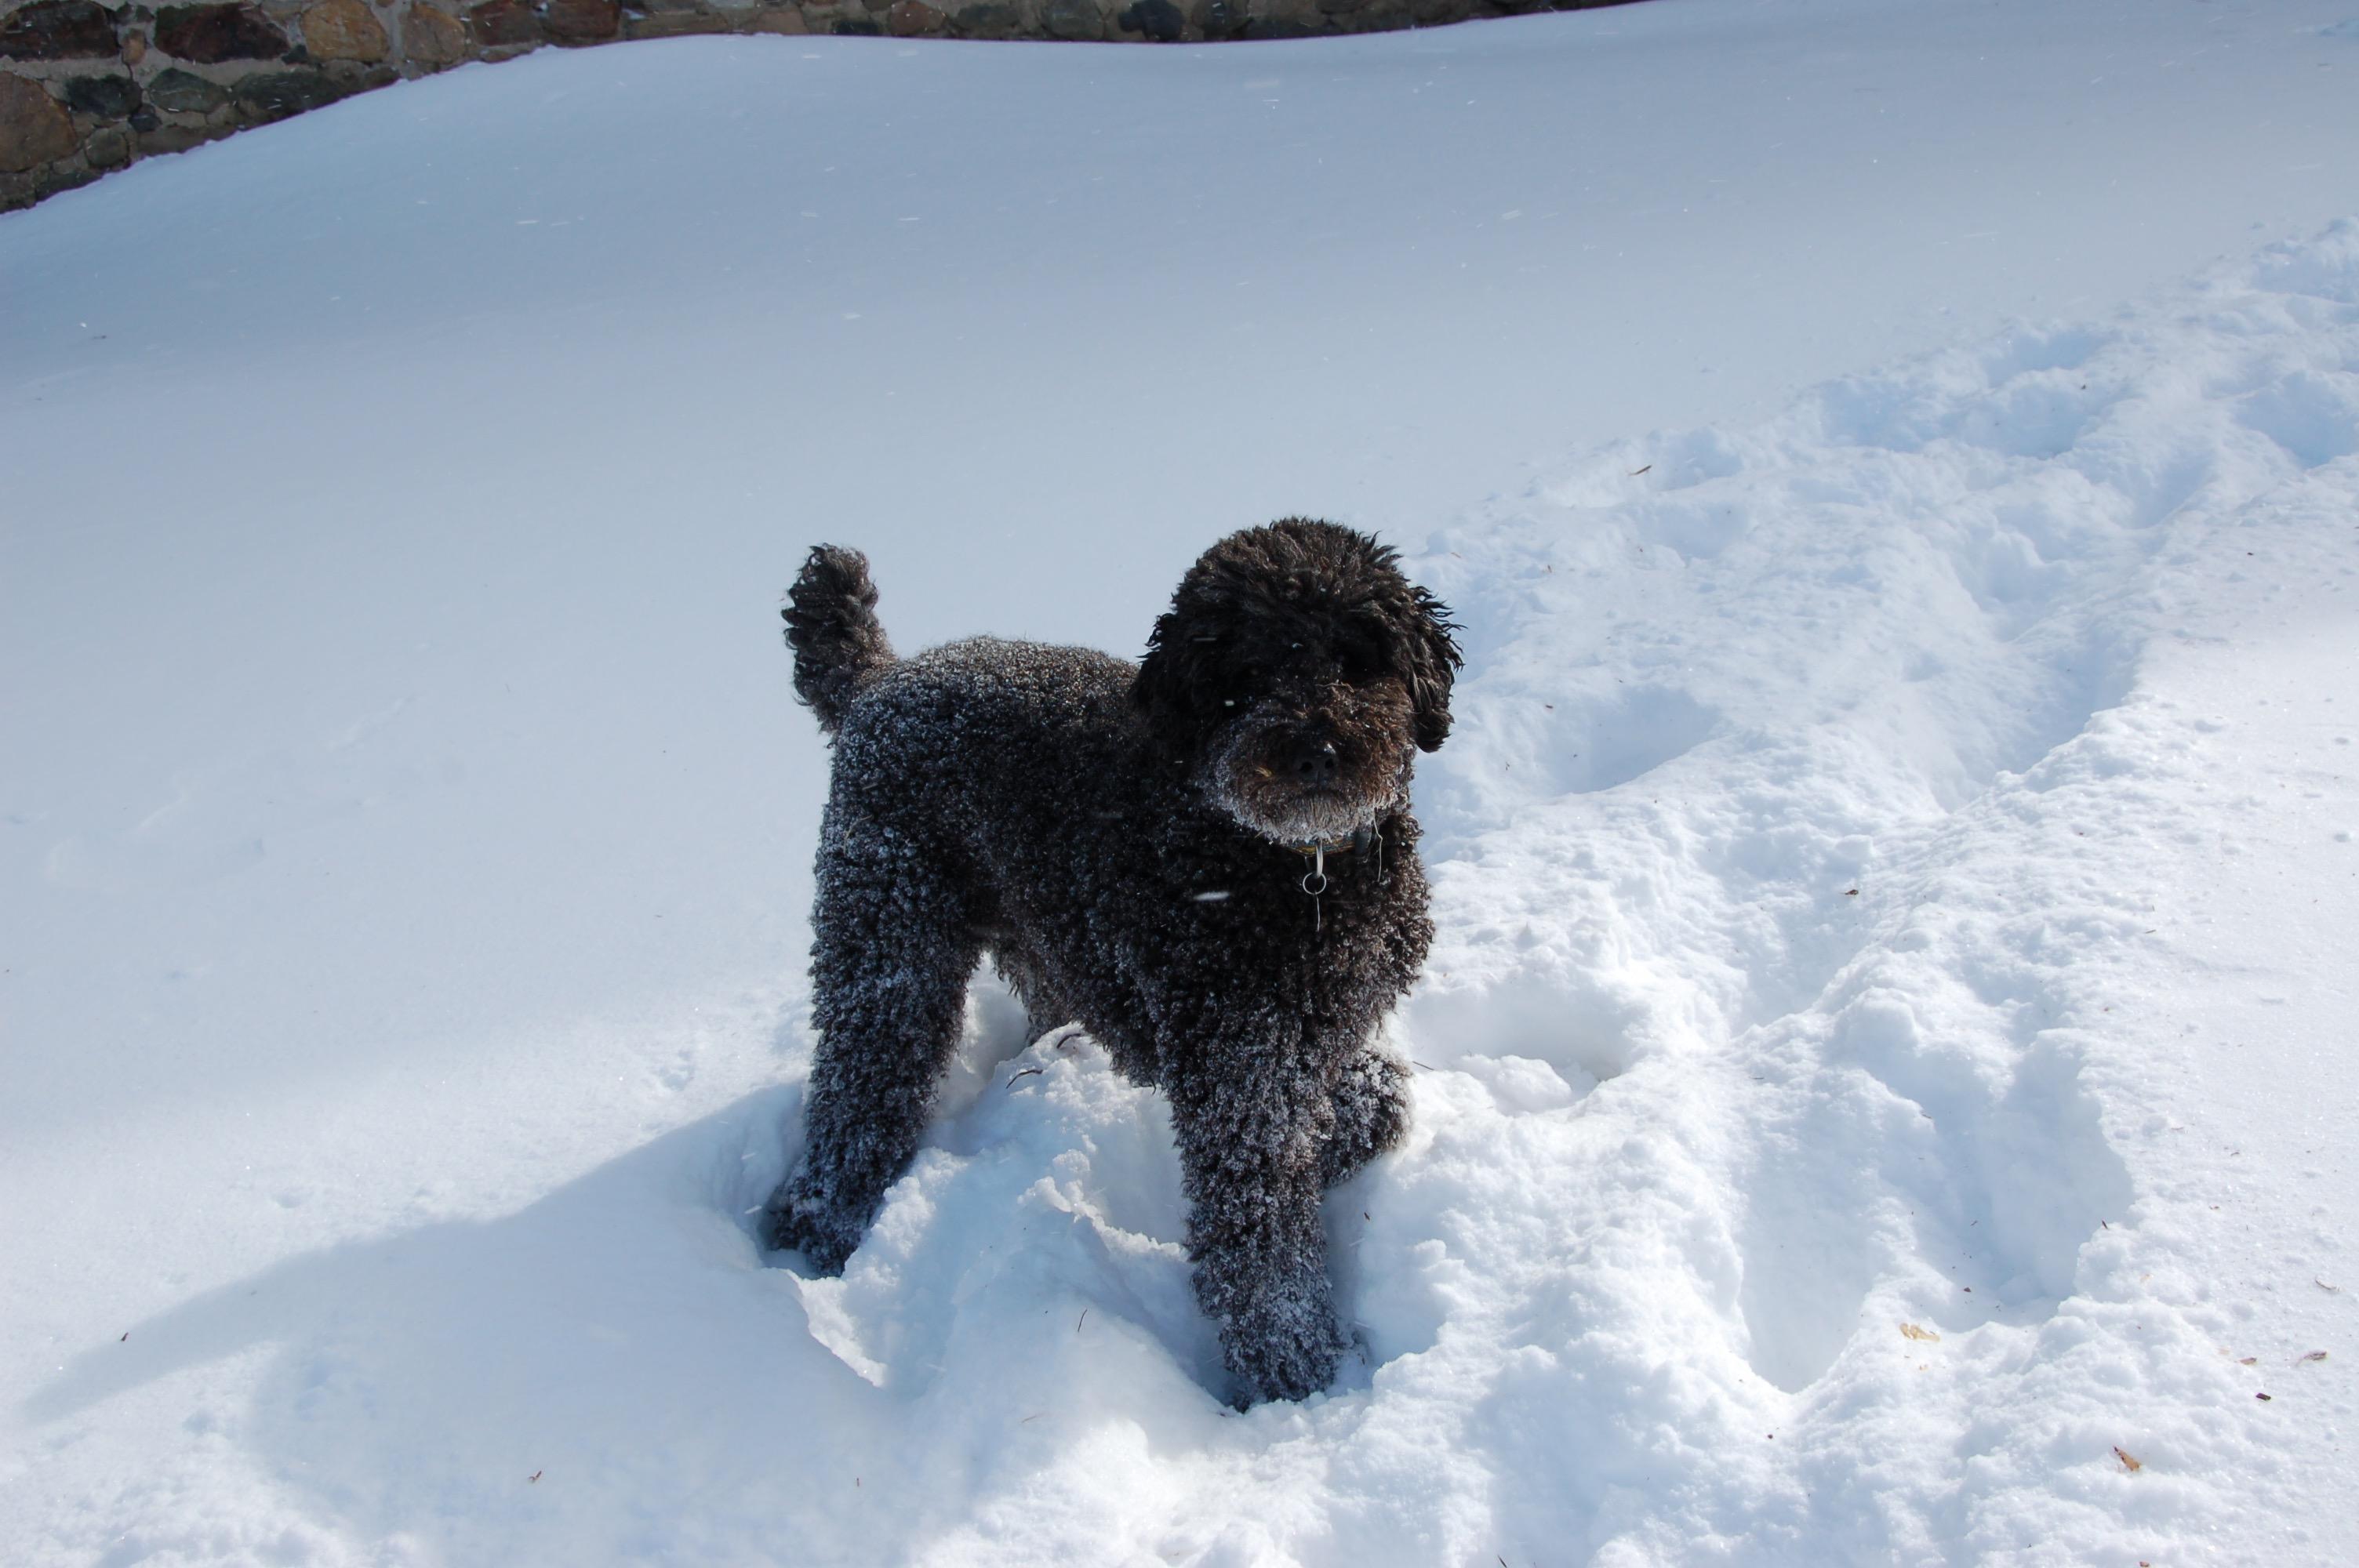 snowy Ivy